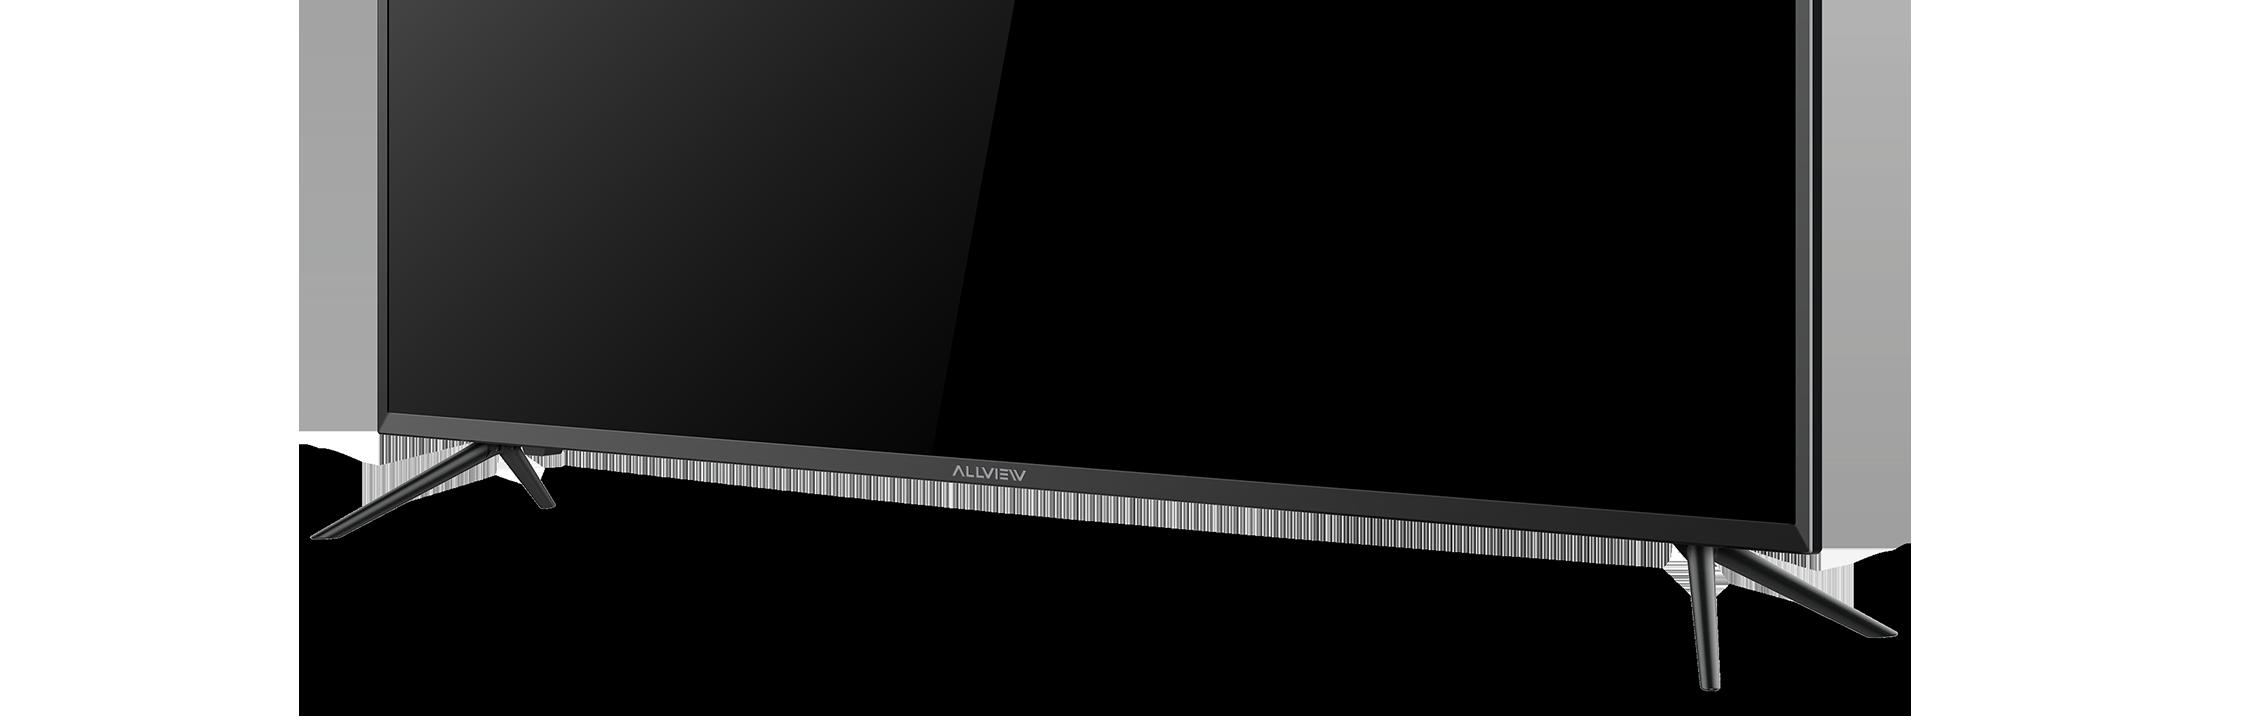 Allview TV